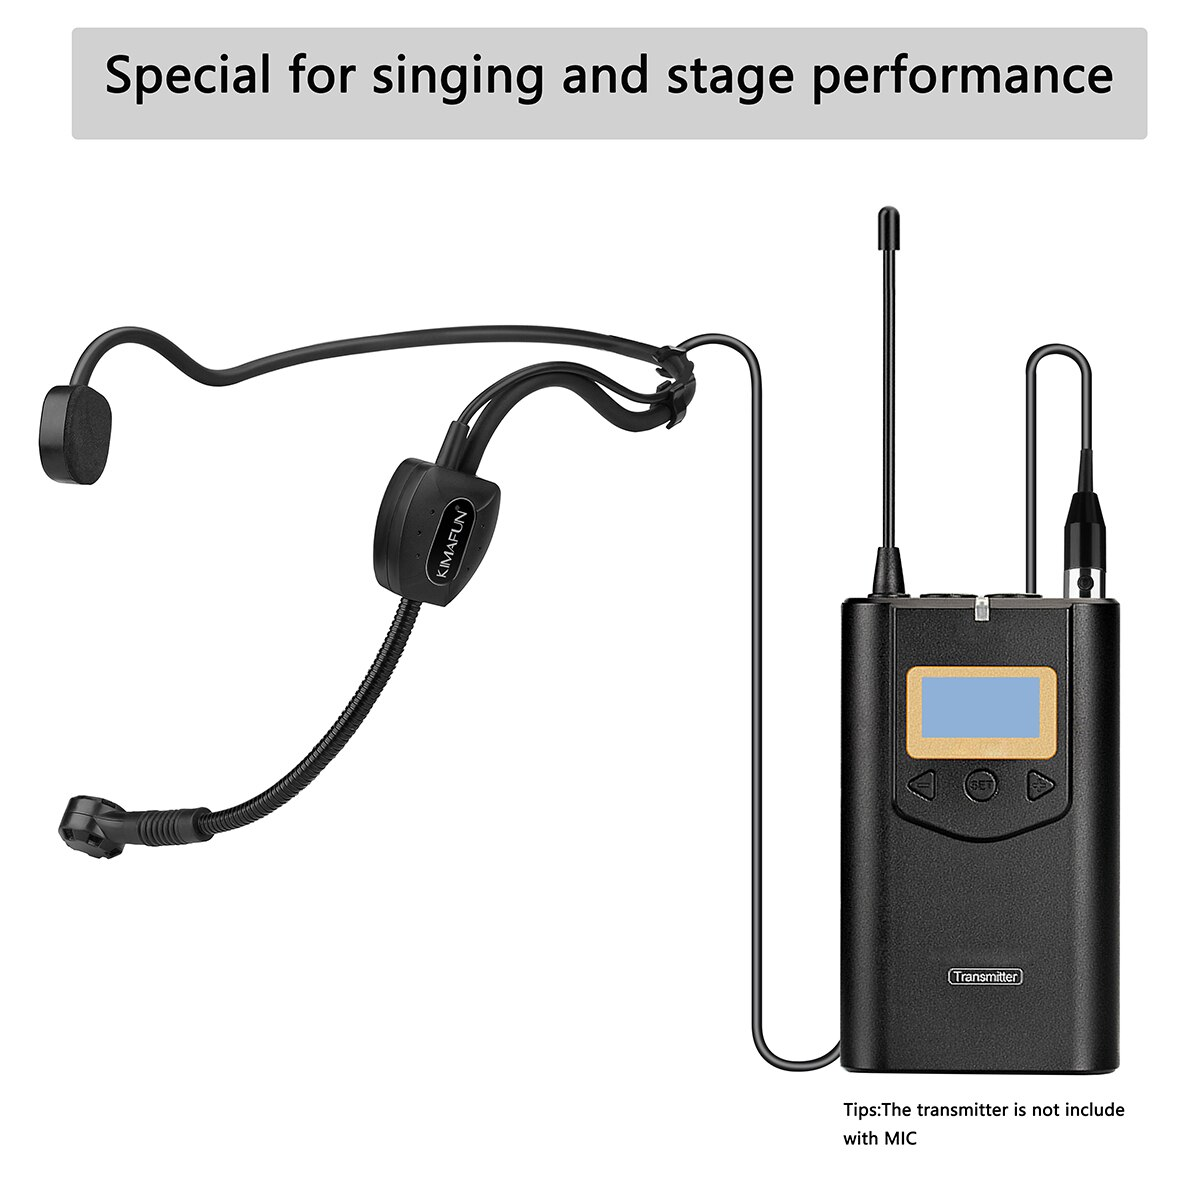 KIMAFUN Black Headset Mic Unidirectional Condenser Microphone For Sennheiser Wireless BodyPack Transmitter 3.5mm Lockable enlarge